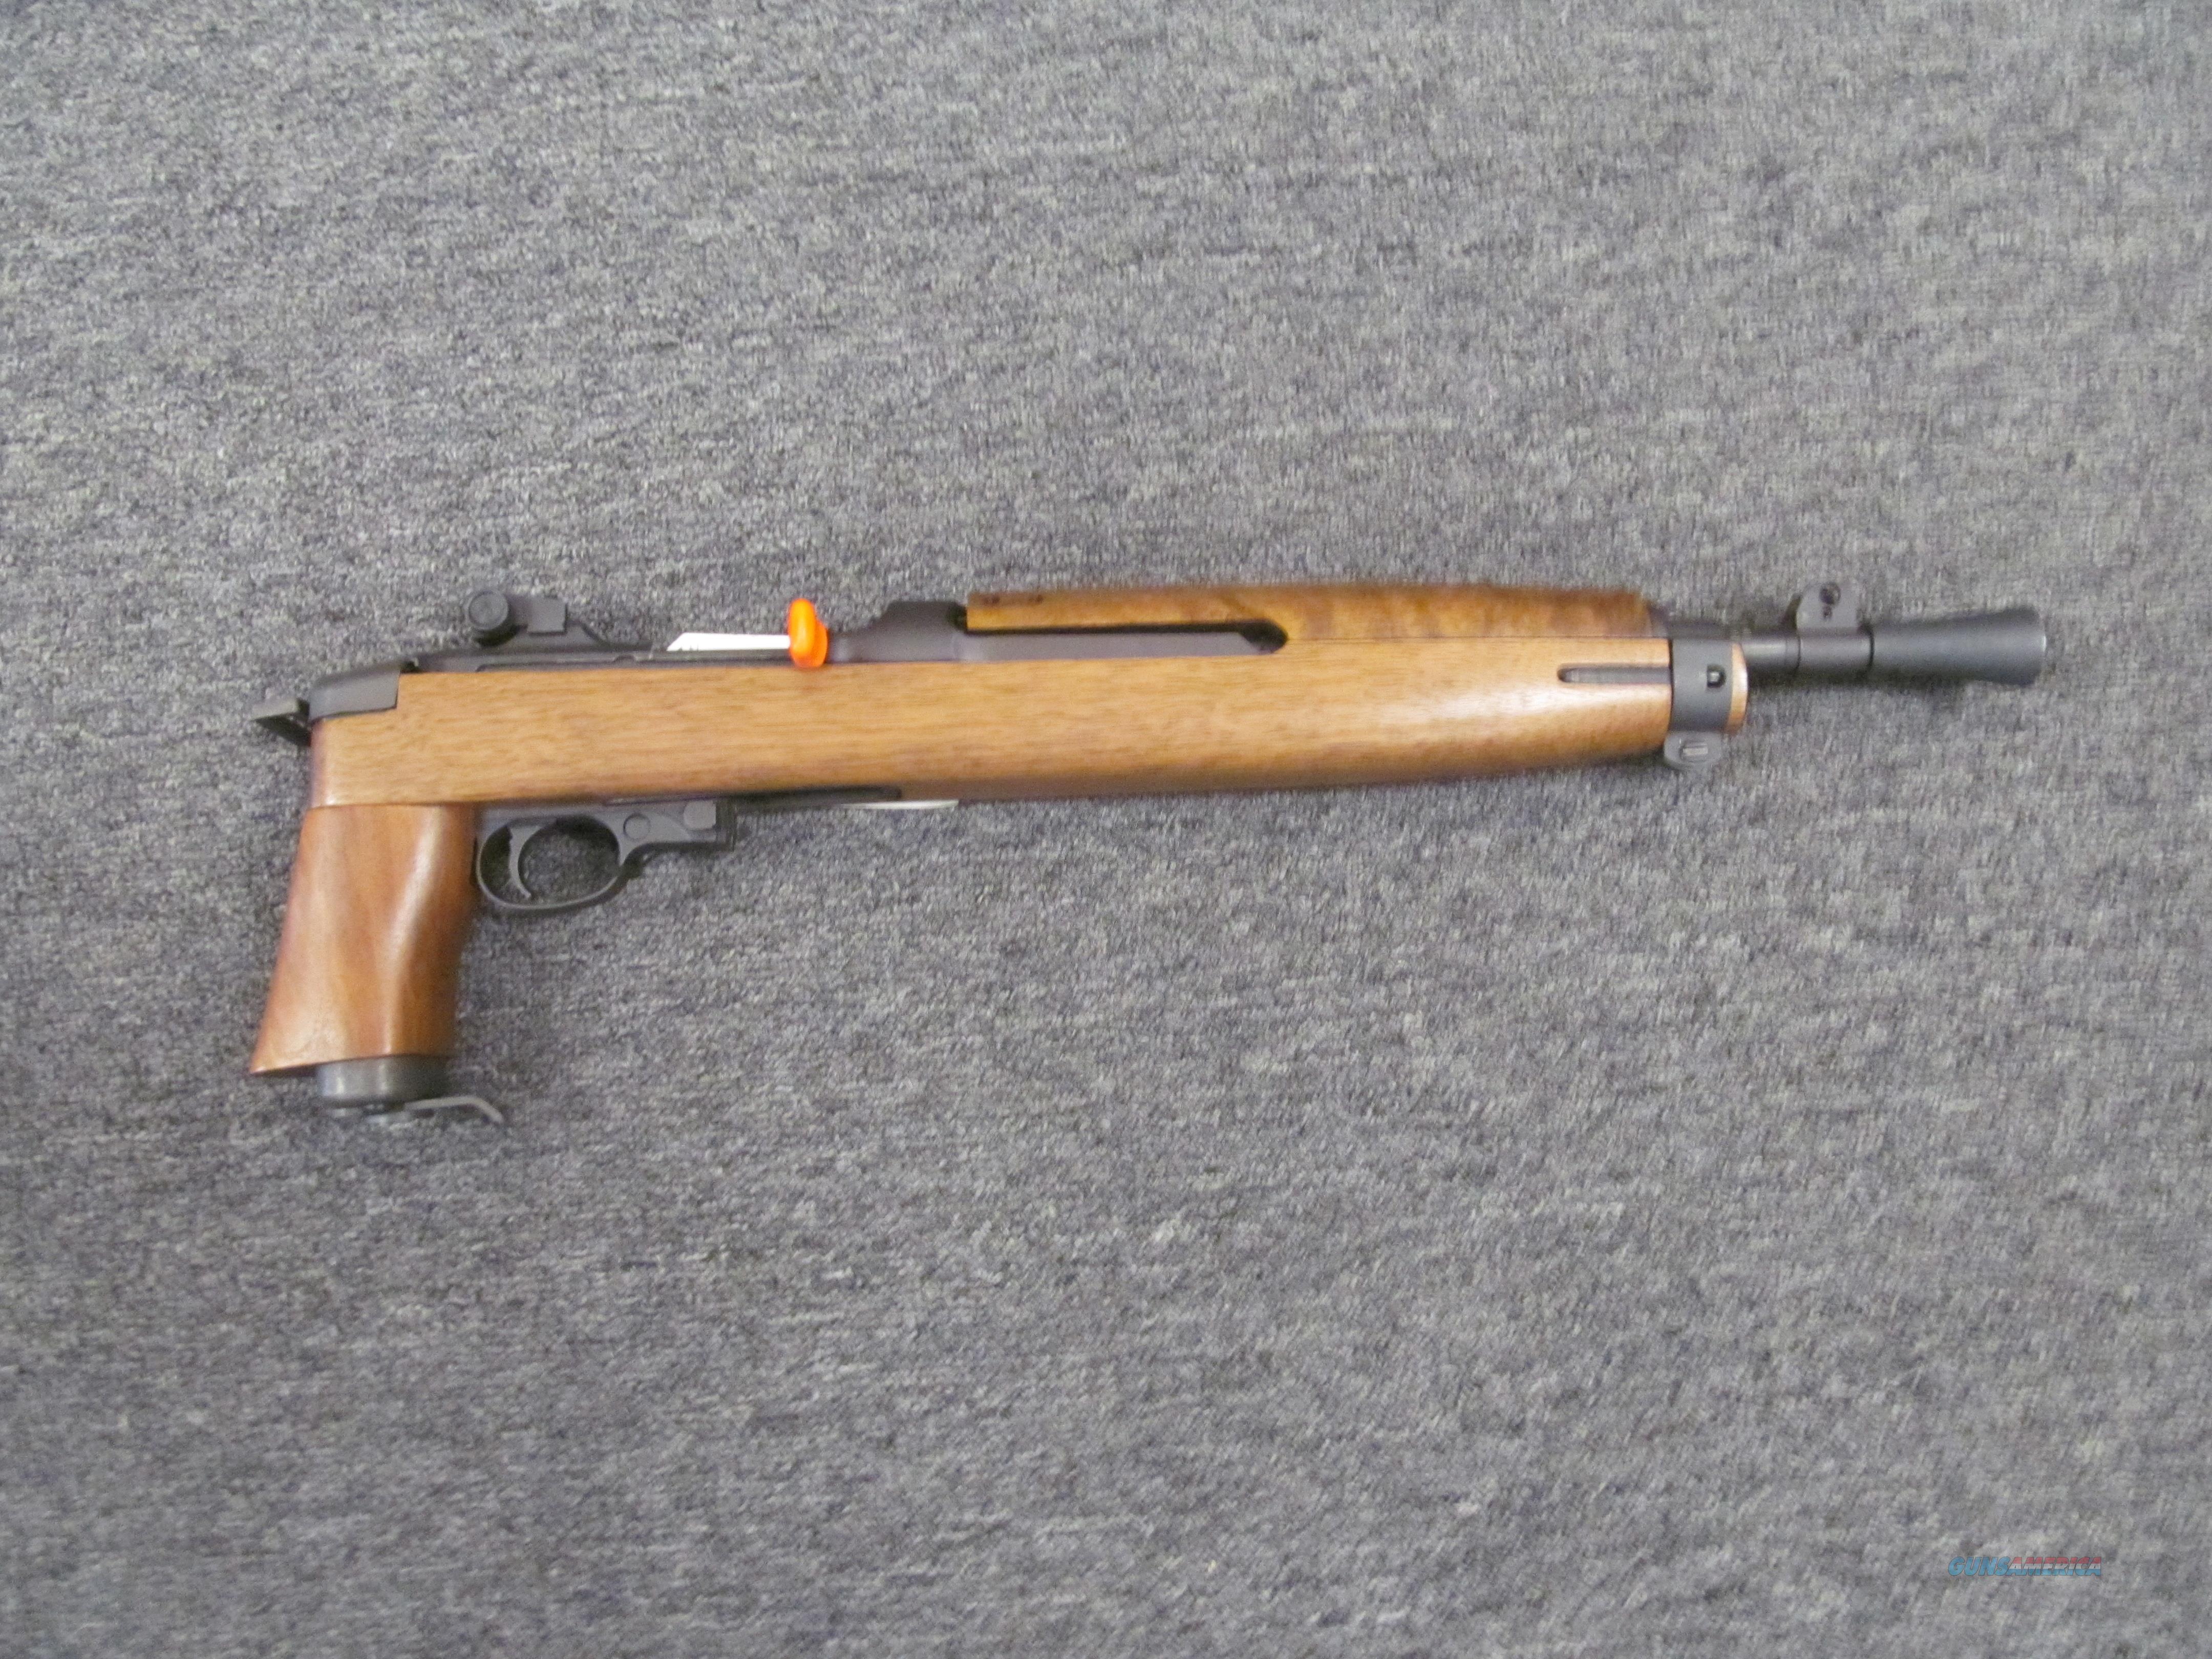 Inland Mfg M1 Advisor  Guns > Pistols > Inland Manufacturing Pistols